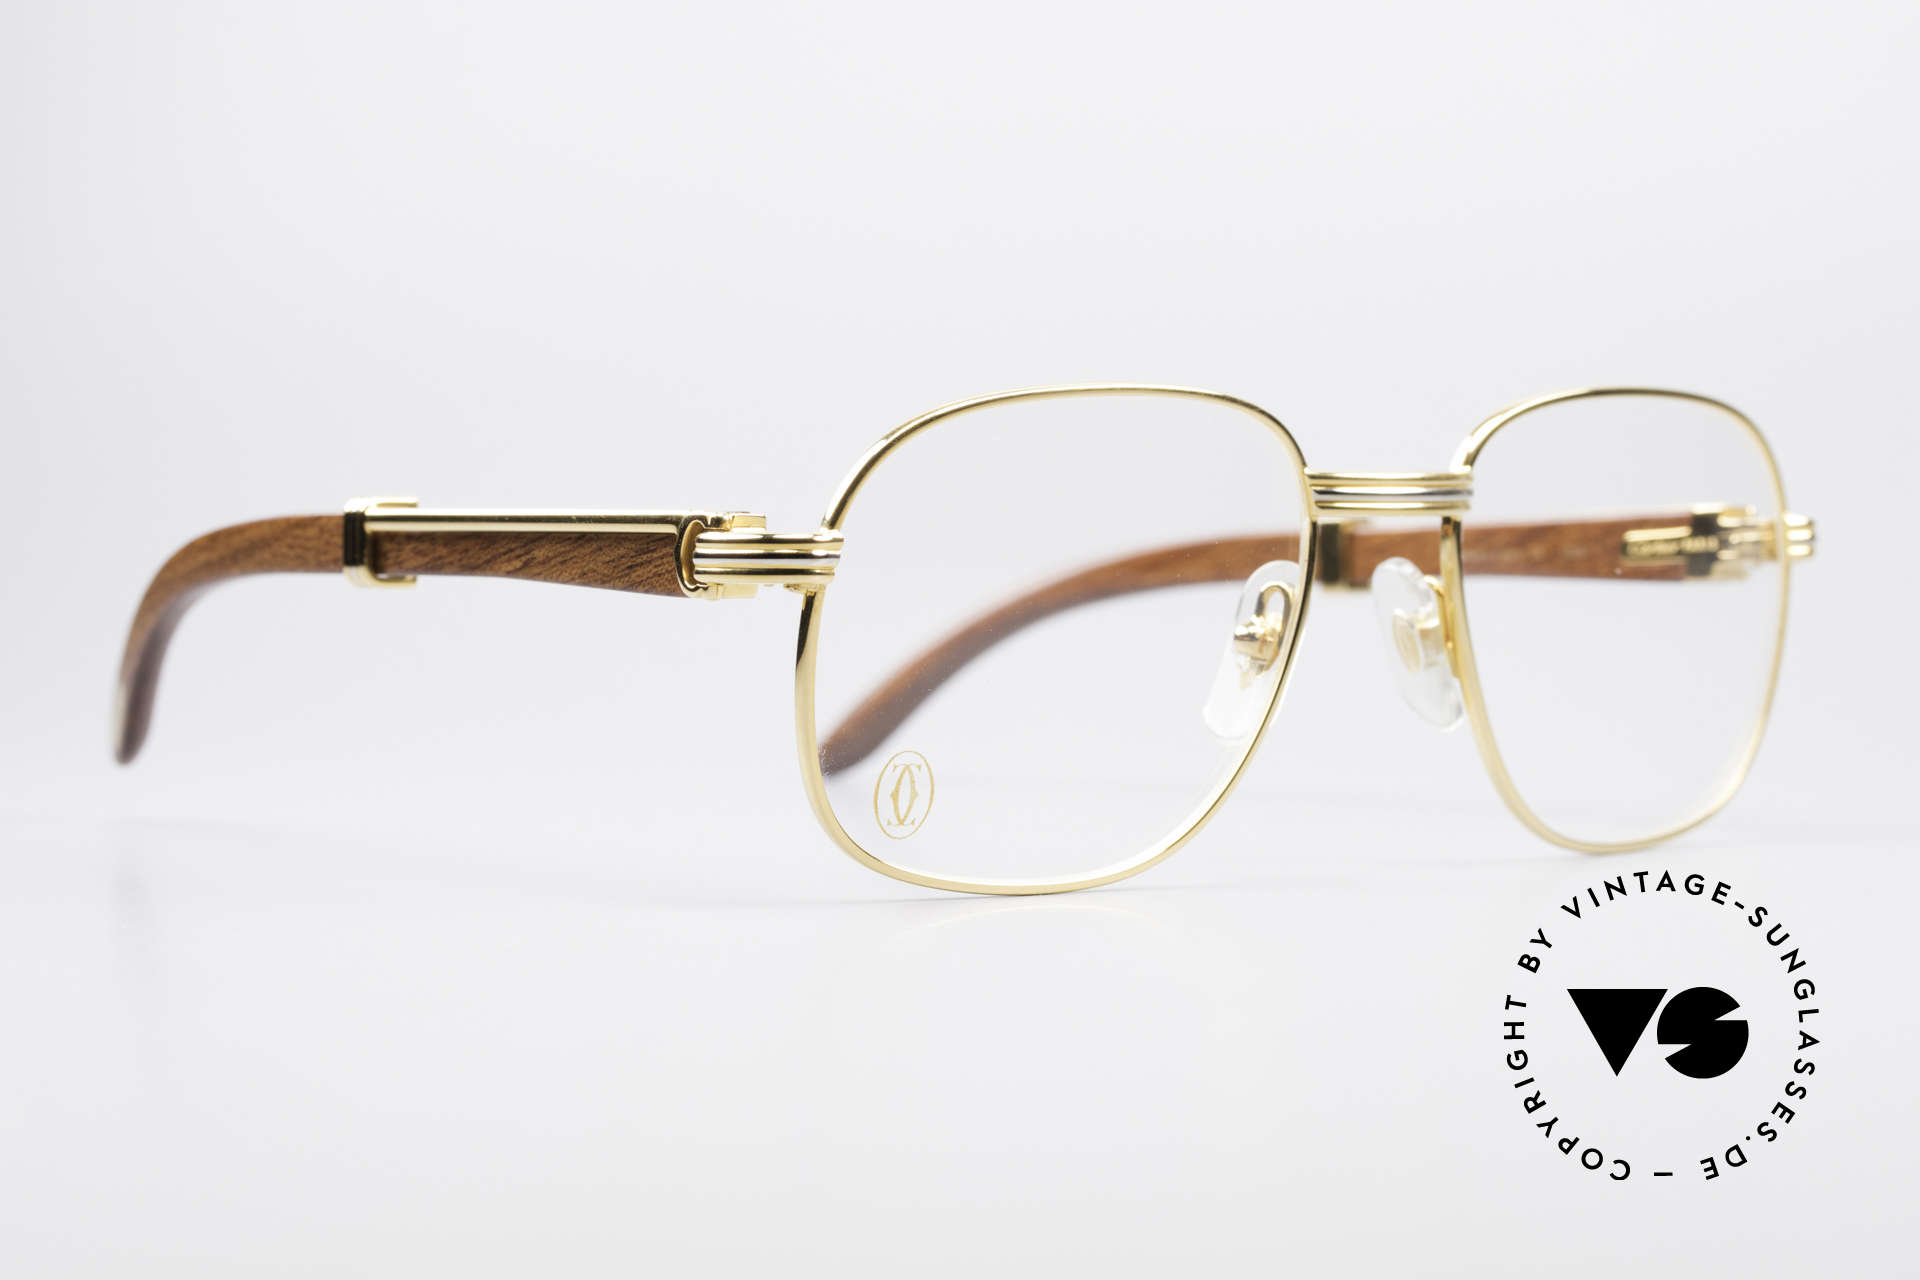 89c16c6eb0694 Glasses Cartier Monceau Bubinga Precious Wood Glasses